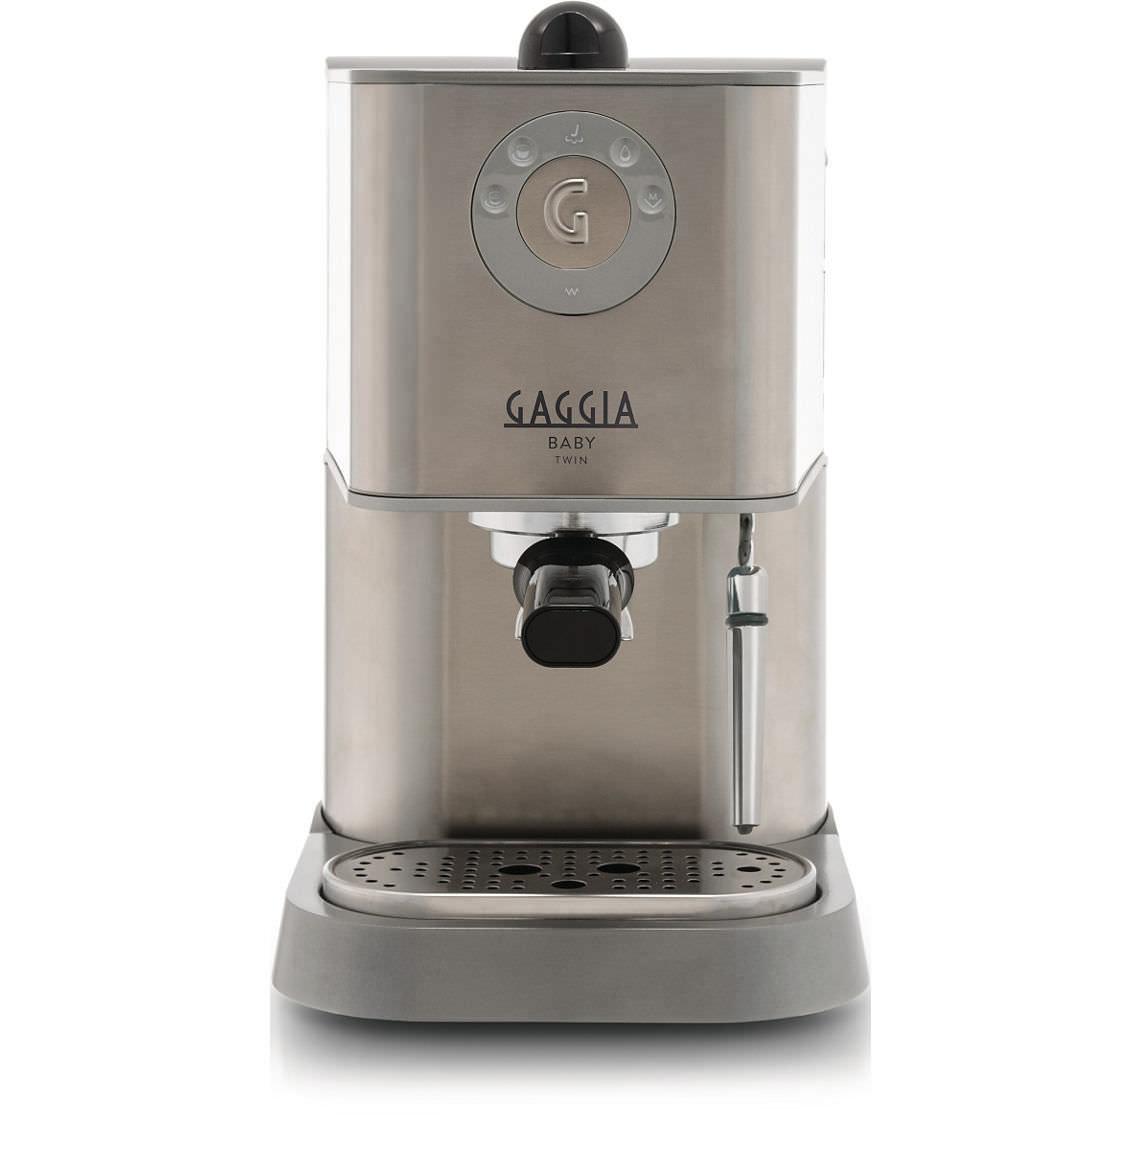 Electronic Baby Gaggia Coffee Machine espresso coffee machine manual baby ri930121 gaggia gaggia